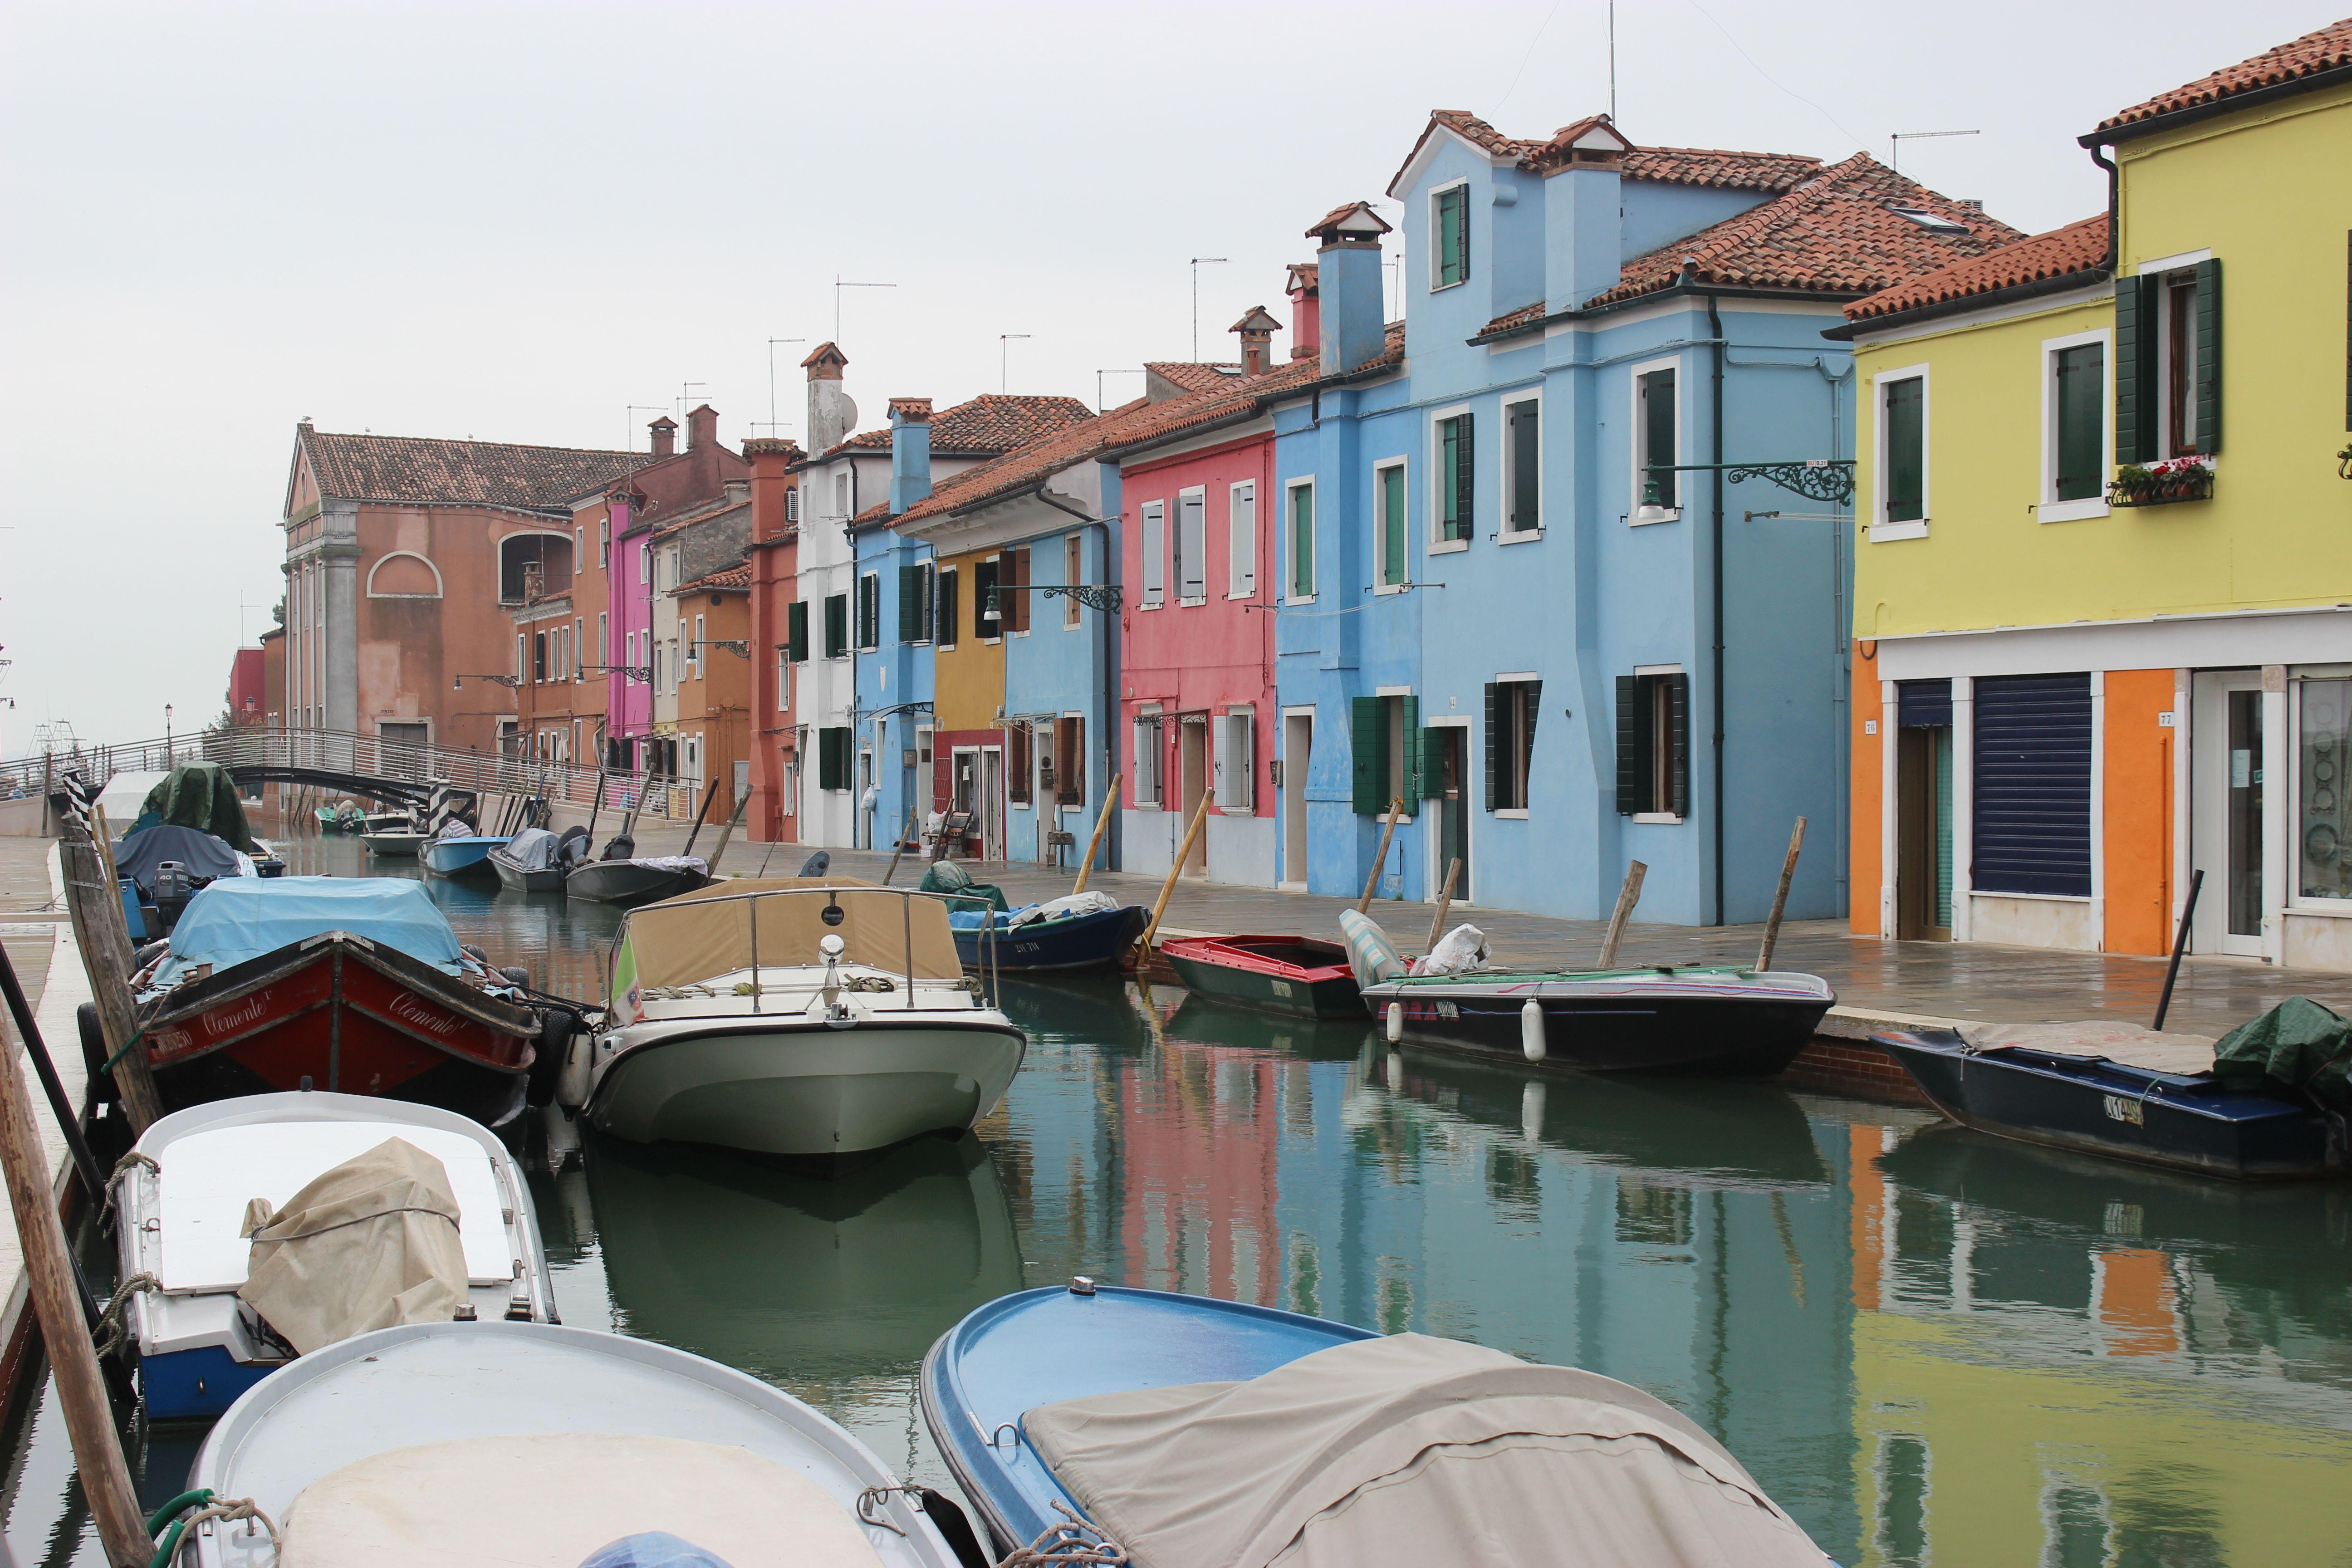 Venice, Italy 2013 By: Joshua Anderson